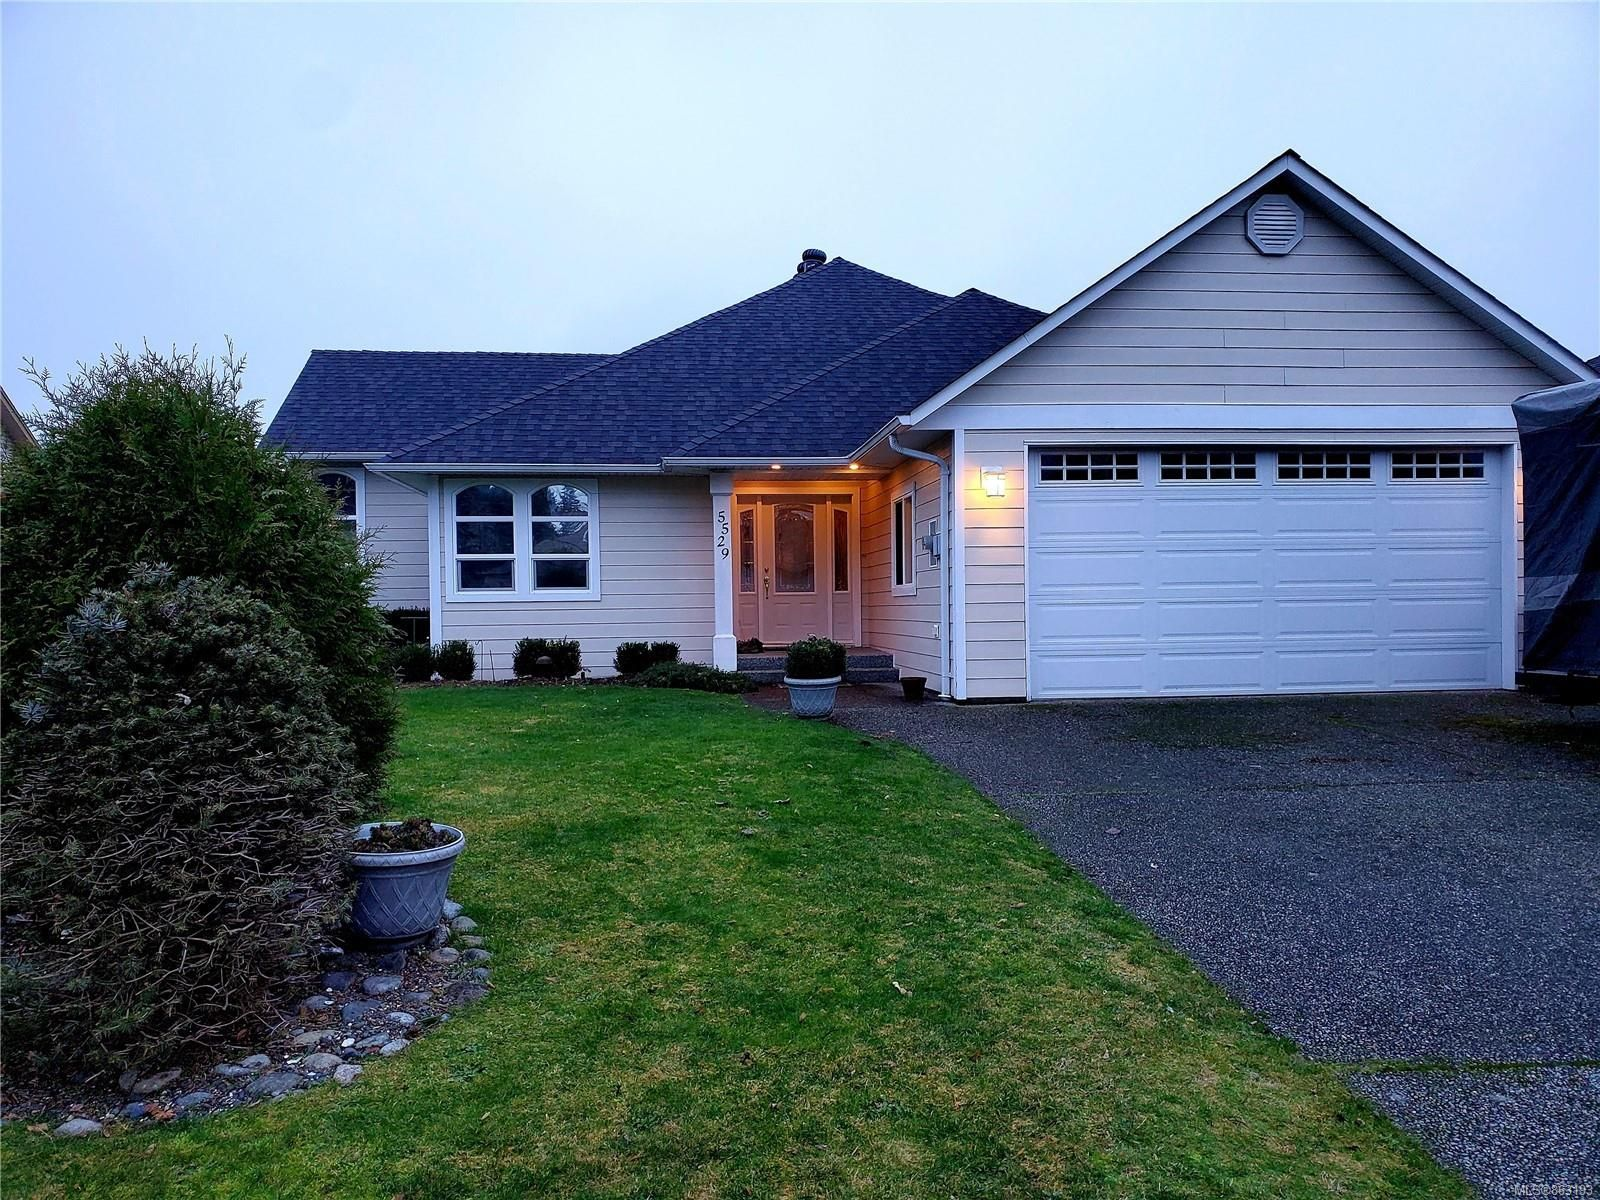 Main Photo: 5529 W Woodland Cres in : PA Port Alberni House for sale (Port Alberni)  : MLS®# 863193